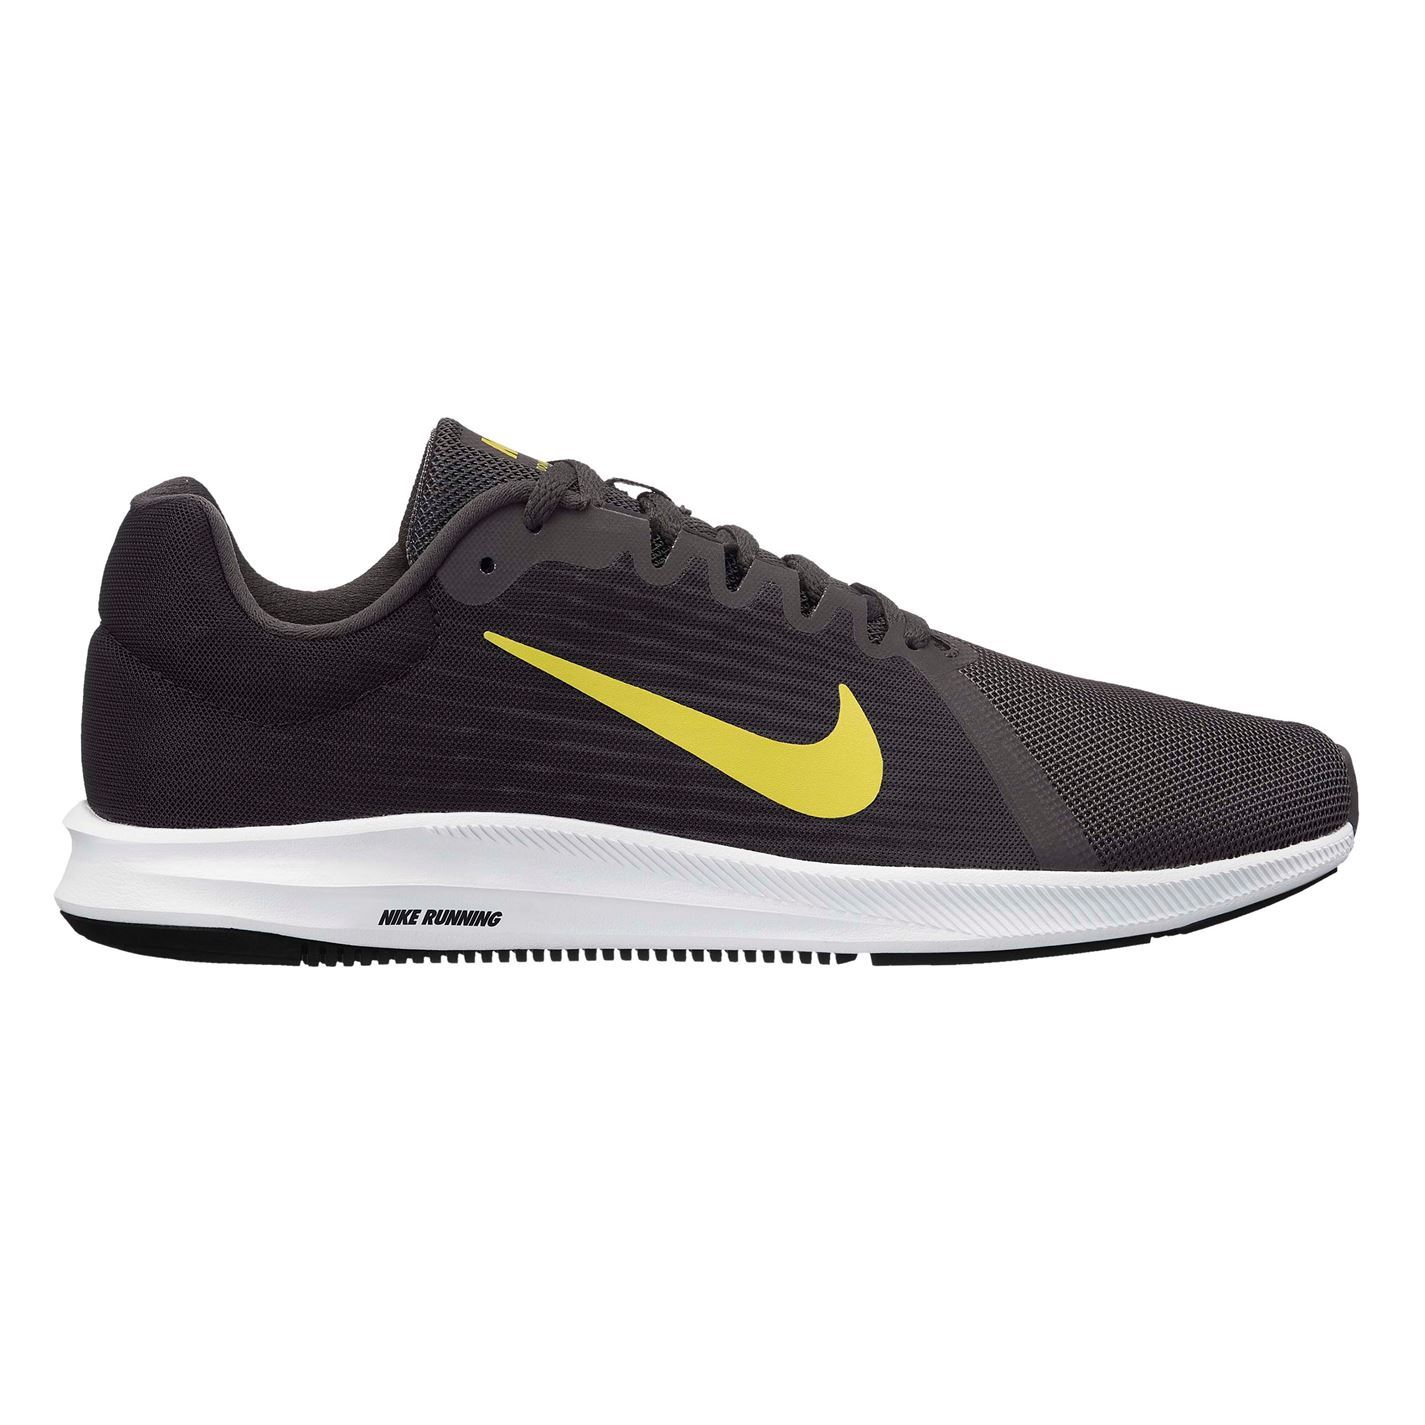 d49fa286e926a2 Nike-Downshifter-8-Laufschuhe-Herren-Fitness-Jogging-Turnschuhe Indexbild